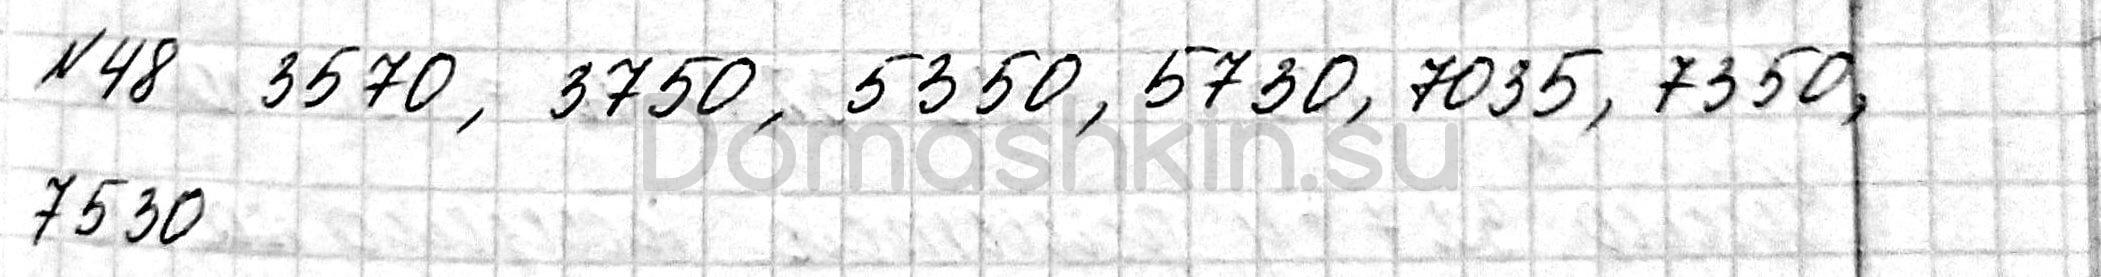 Математика 6 класс учебник Мерзляк номер 48 решение